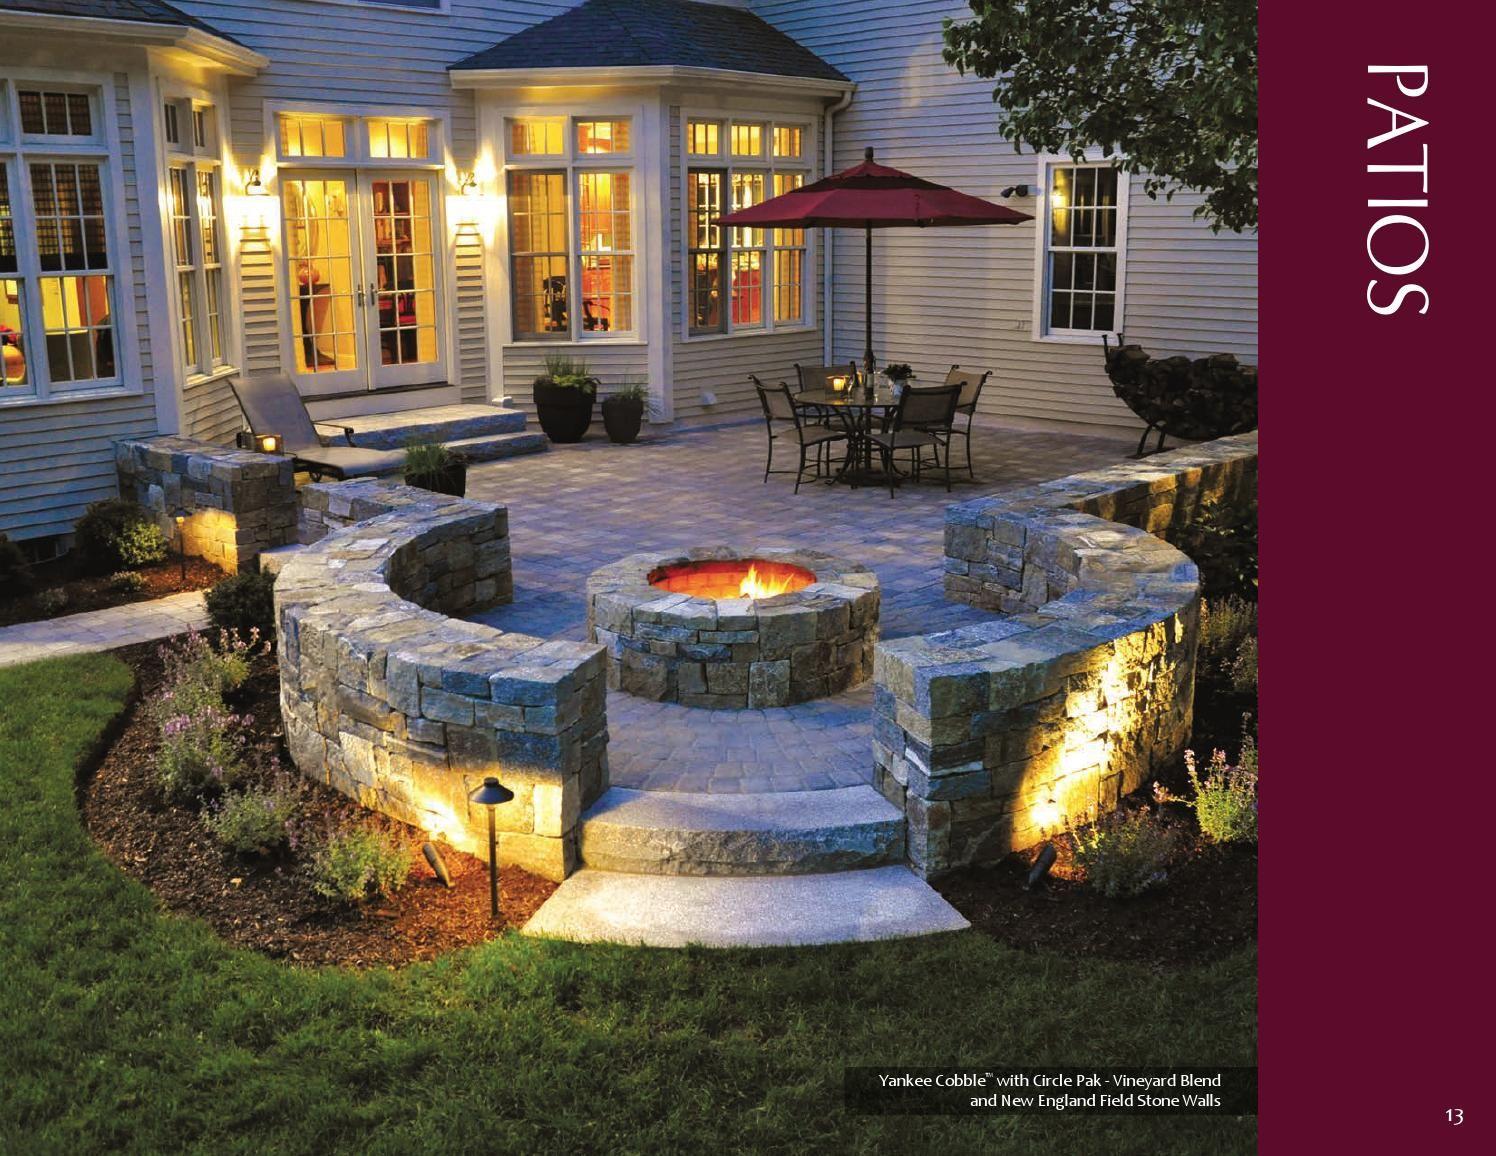 Ideal Concrete Catalog Summer 2013